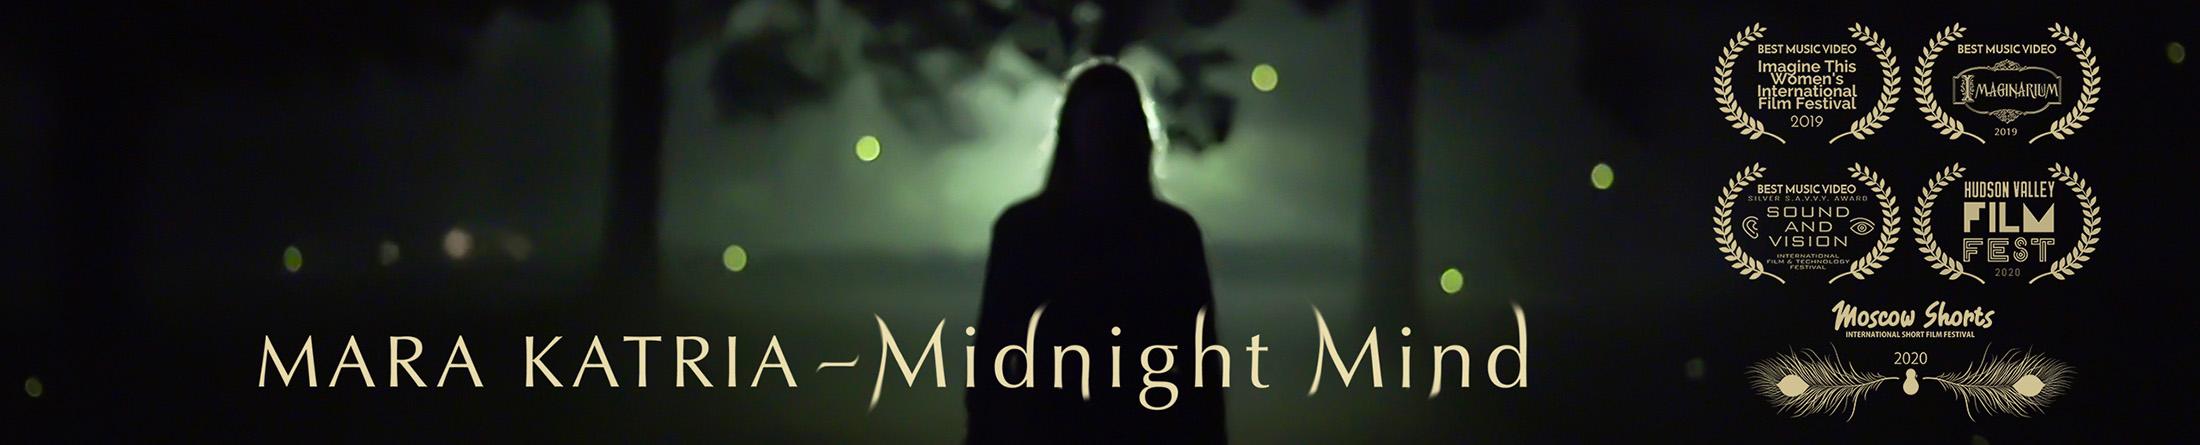 "Midnight Mind by Mara Katria ""Dragon's Breath"" Poster"